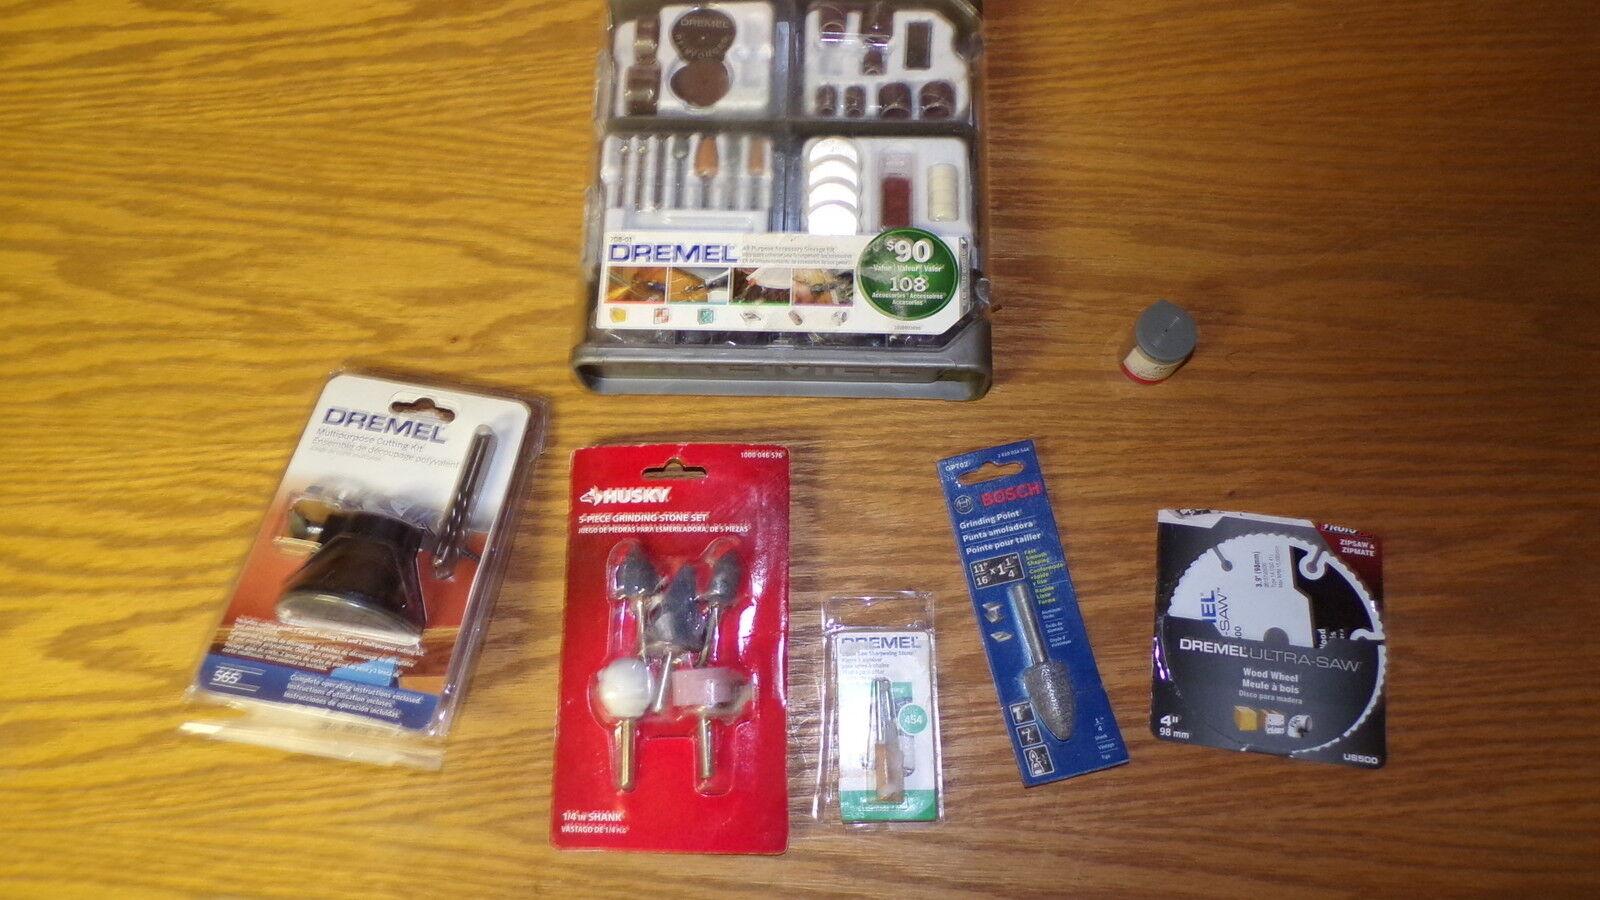 Lot of Dremel Husky & Bosch Grinding Stones Kits, ALL NEW FREE SHIPPING